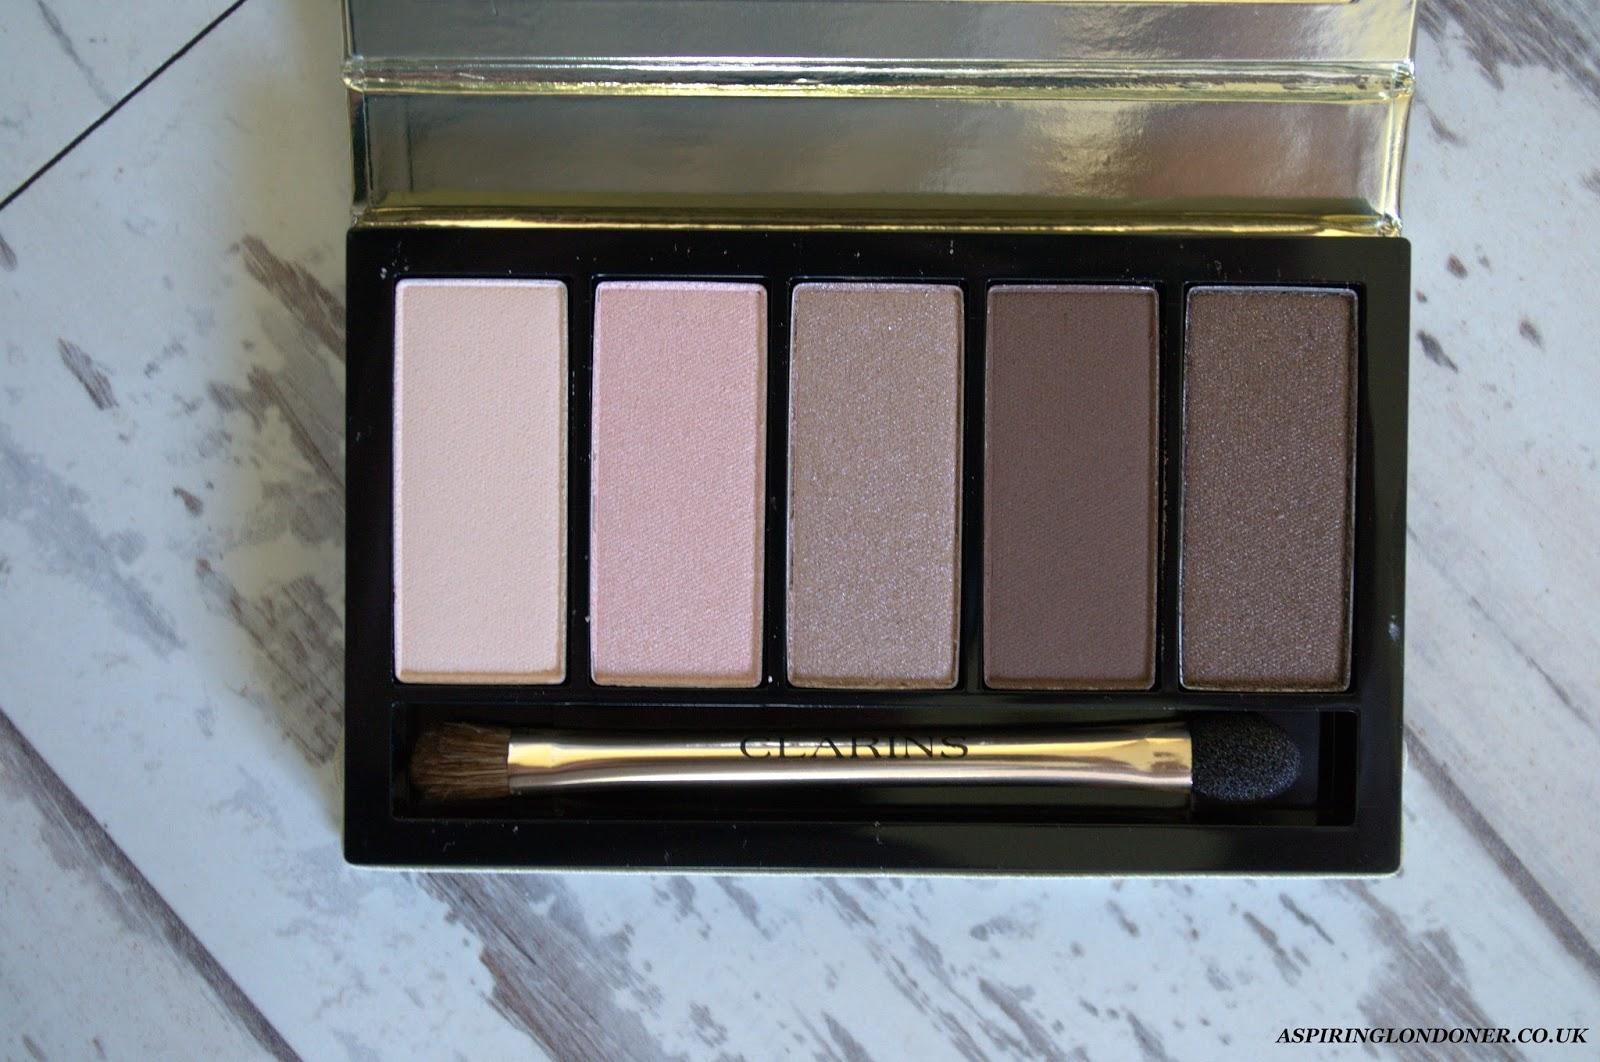 Clarins Pretty Day 5 Colour Eyeshadow Palette Swatch - Aspiring Londoner